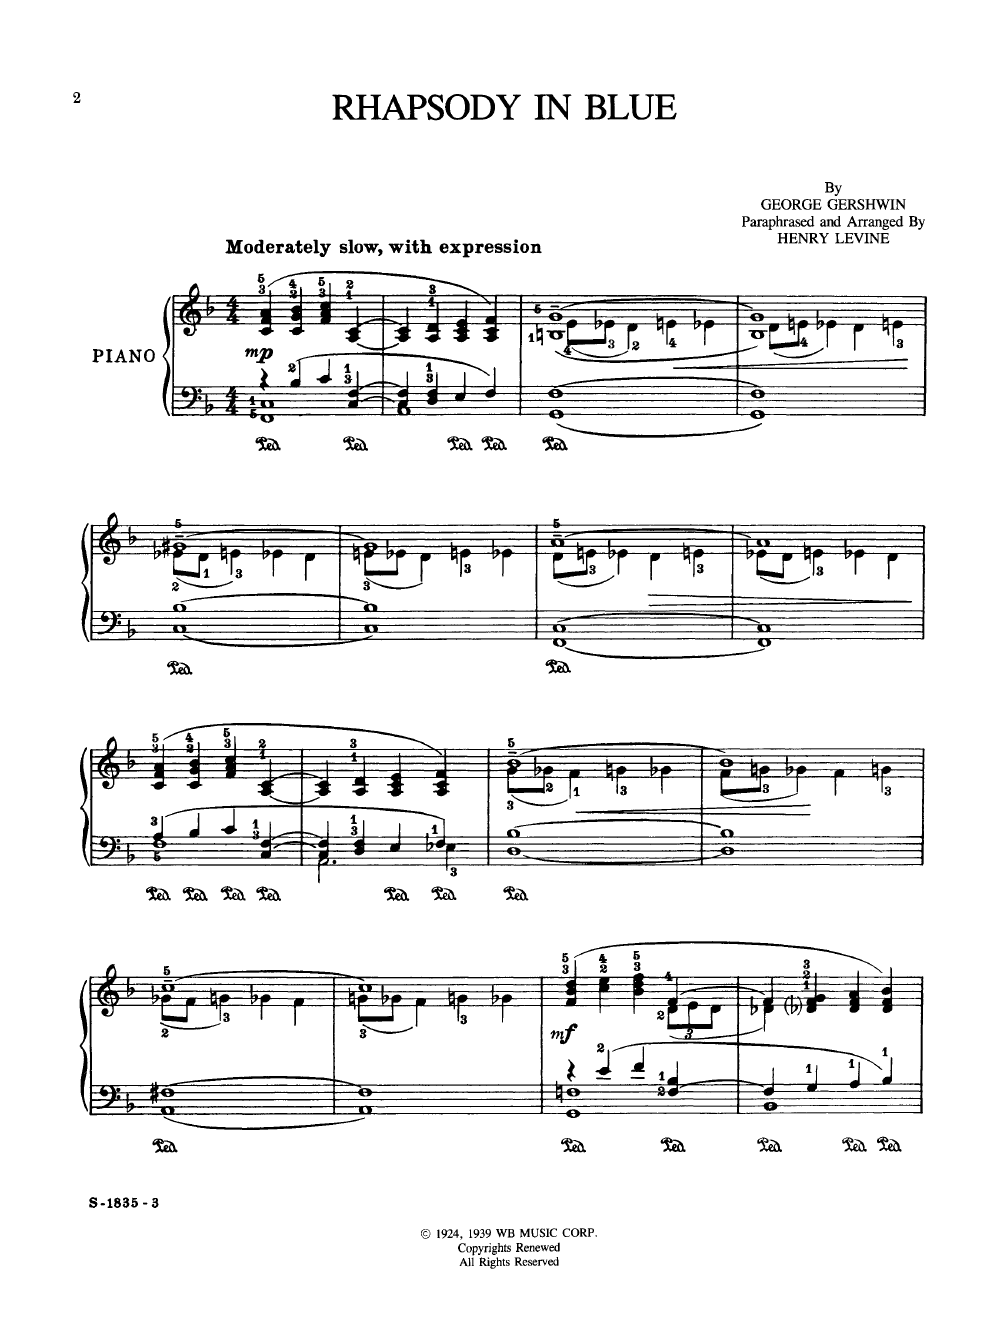 Get PDF Rhapsody in Blue George Gershwin Intermediate Piano Sheet Music